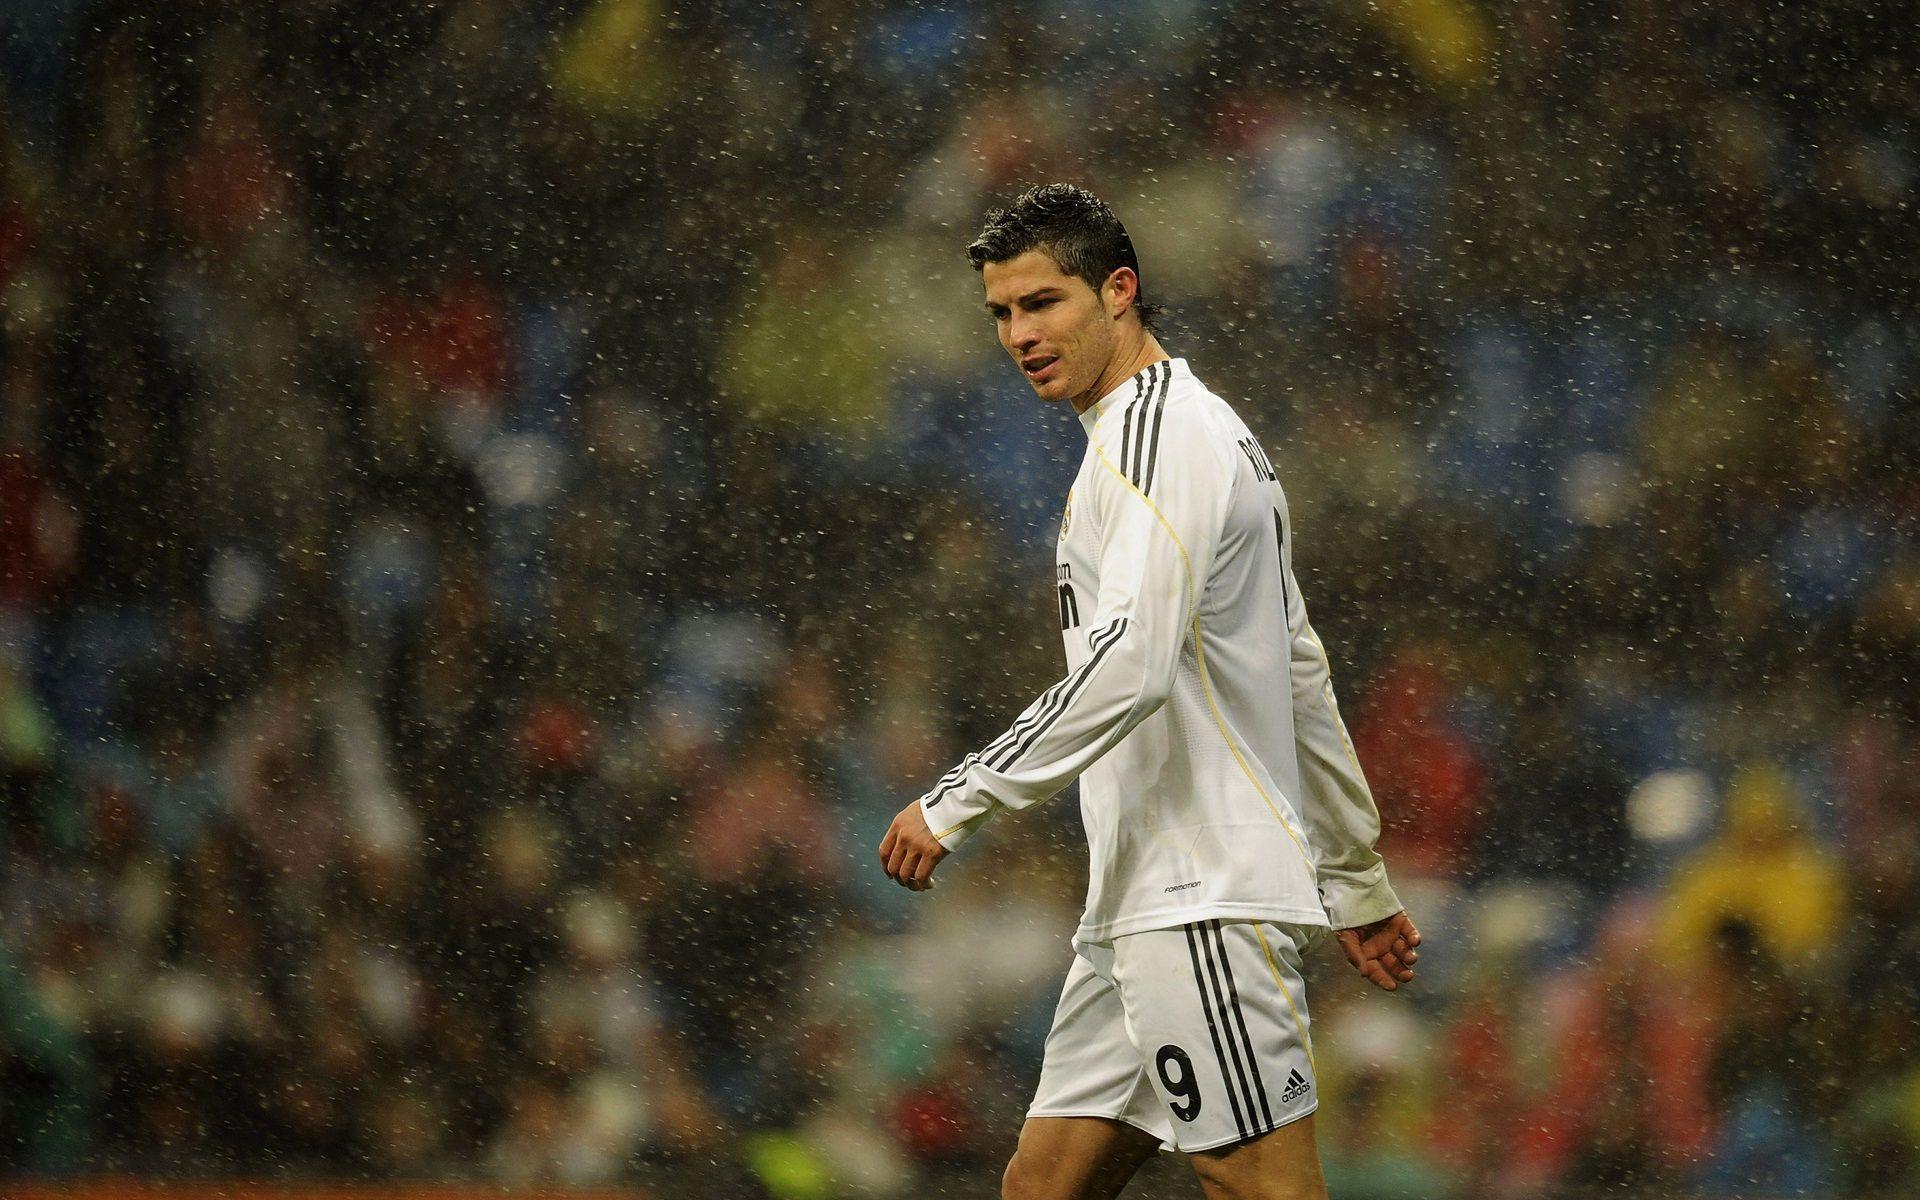 Football Players HD Wallpaper – Cristiano Ronaldo, Portugal, Real ...